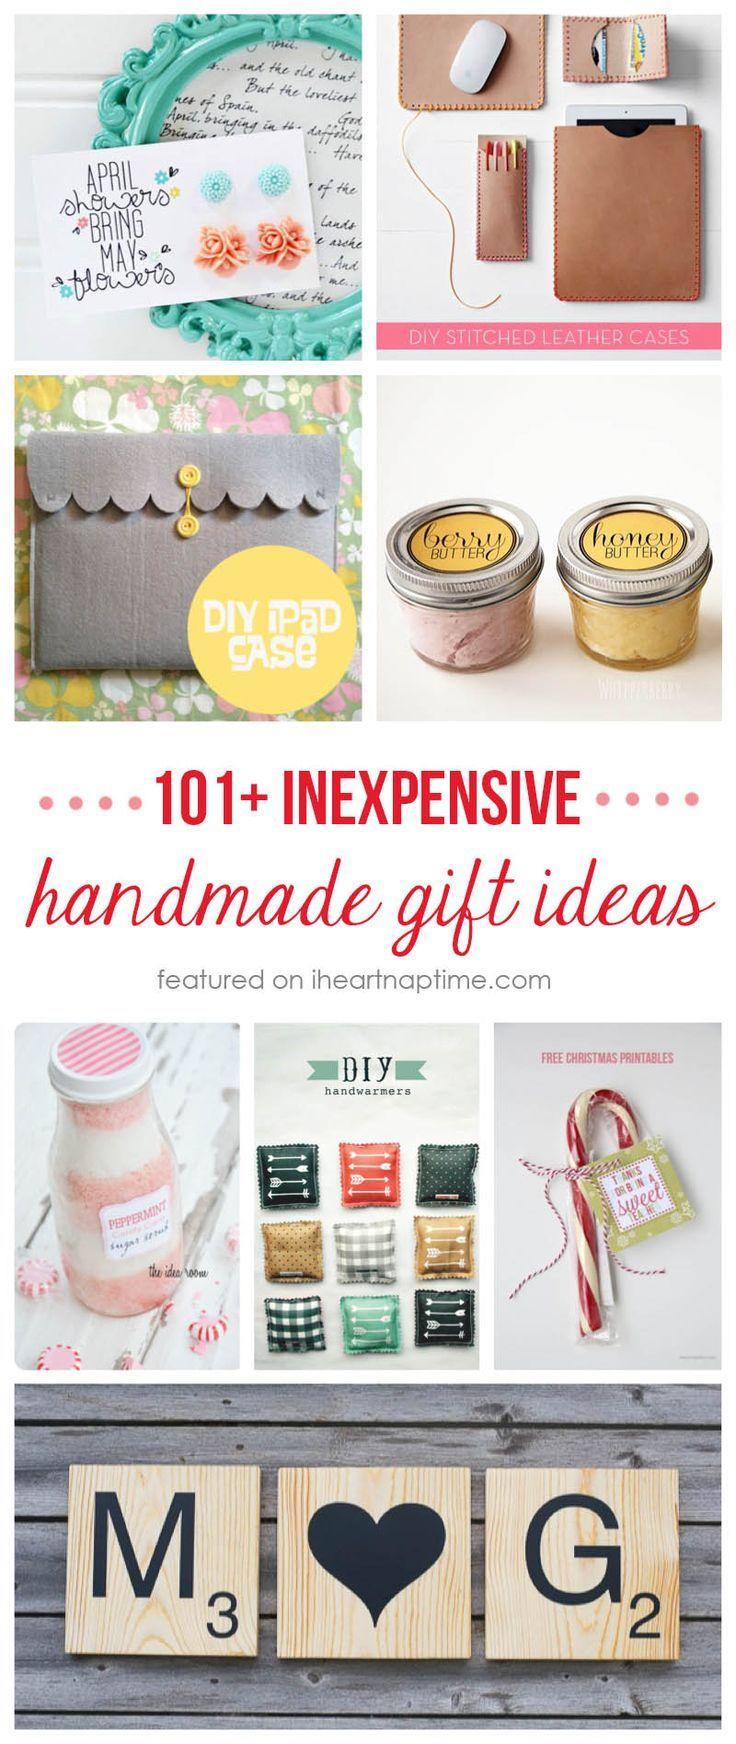 101+ inexpensive handmade Christmas gifts I Heart Nap Time | I Heart ...